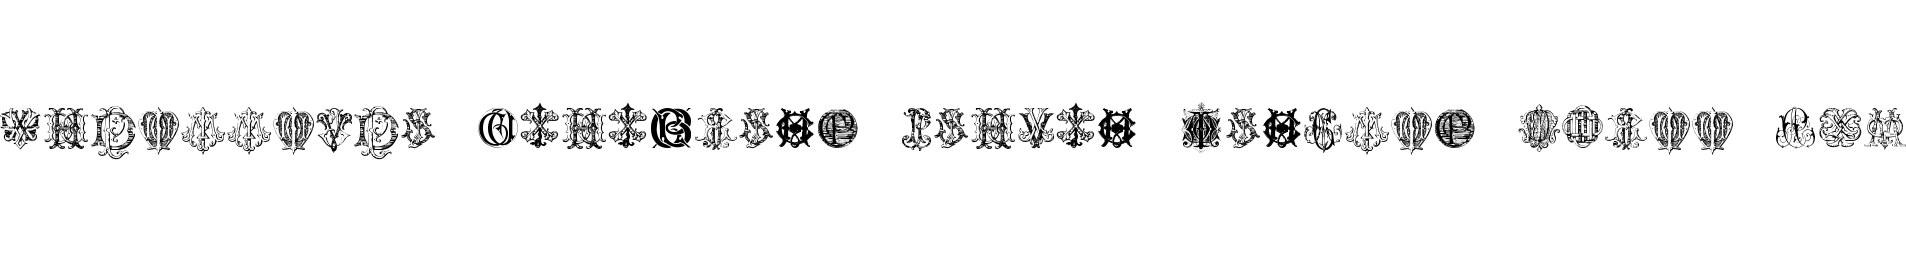 Intellecta Monograms Random Samples Three.vfb